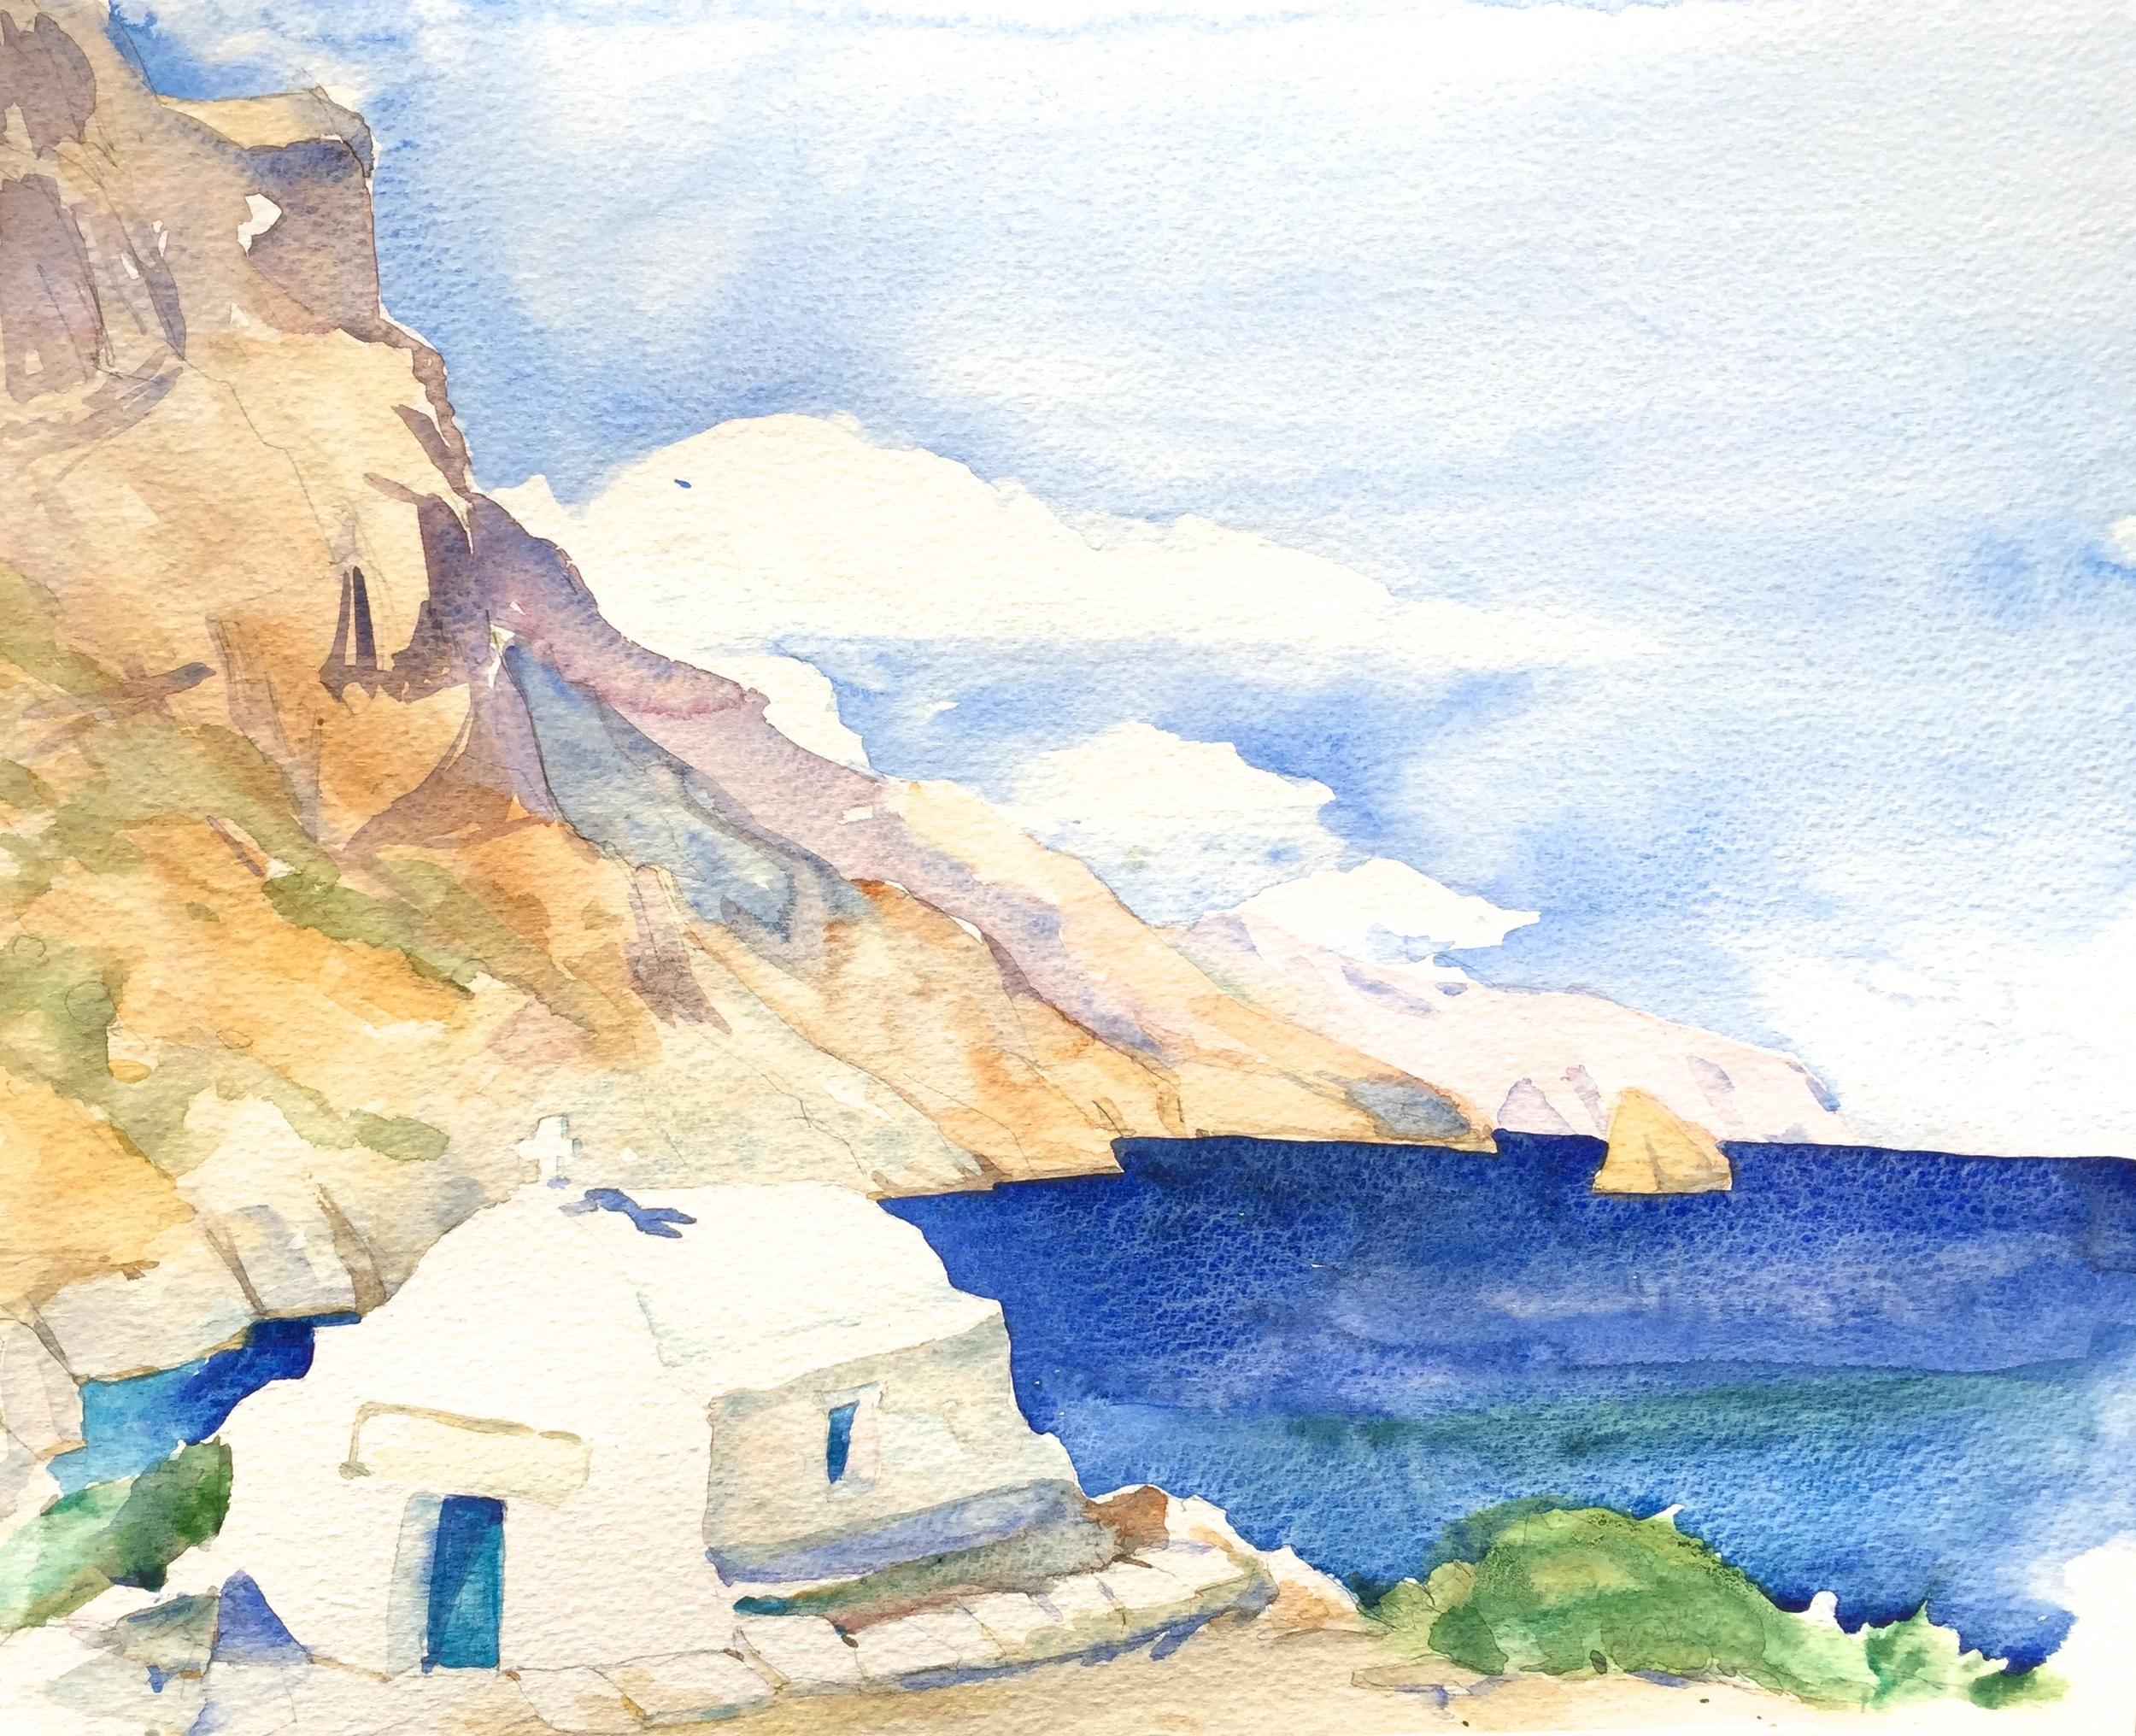 Aghia Anna, Amorgos